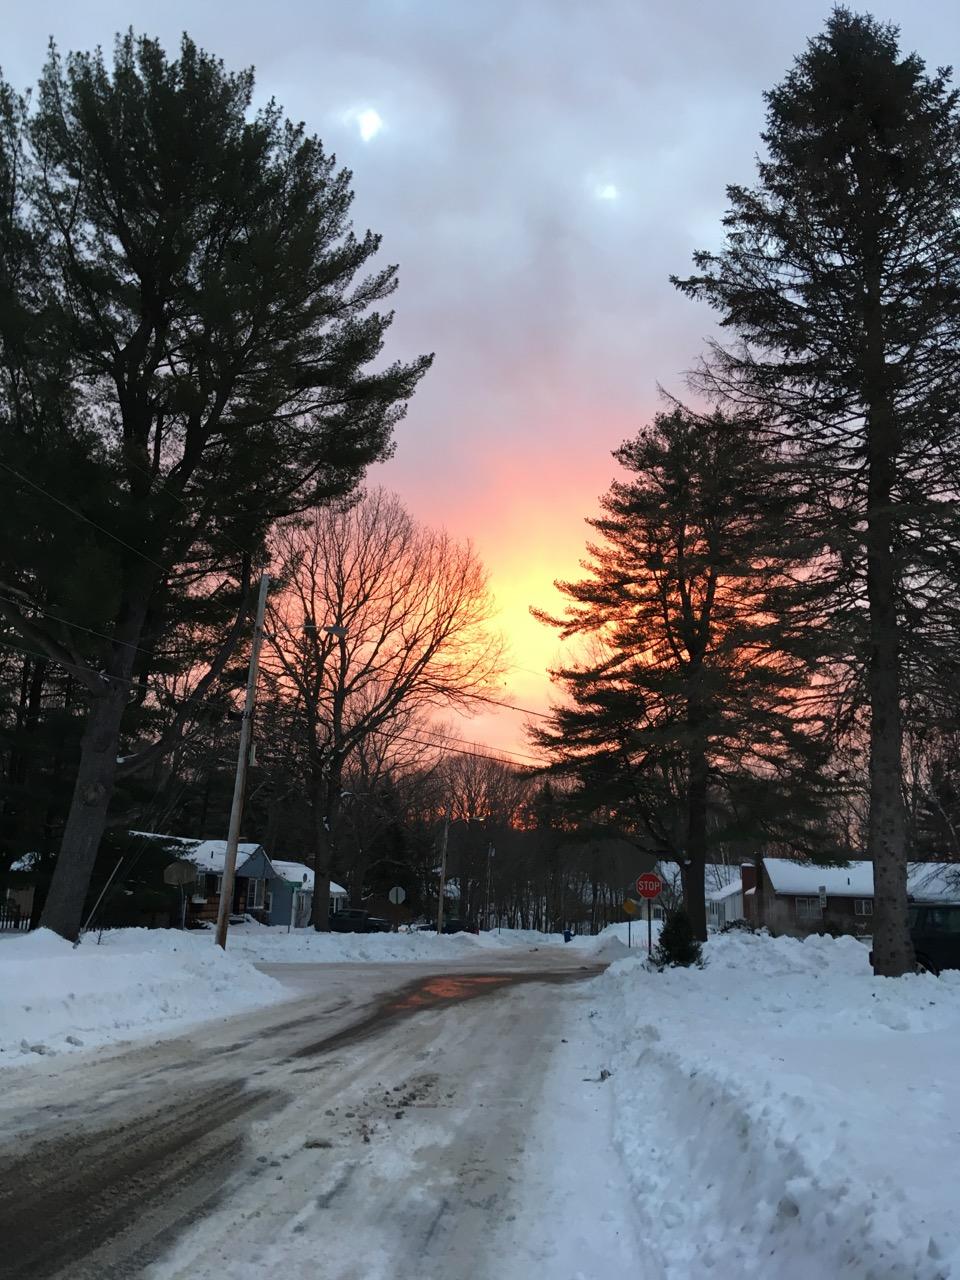 Sunrise surprise